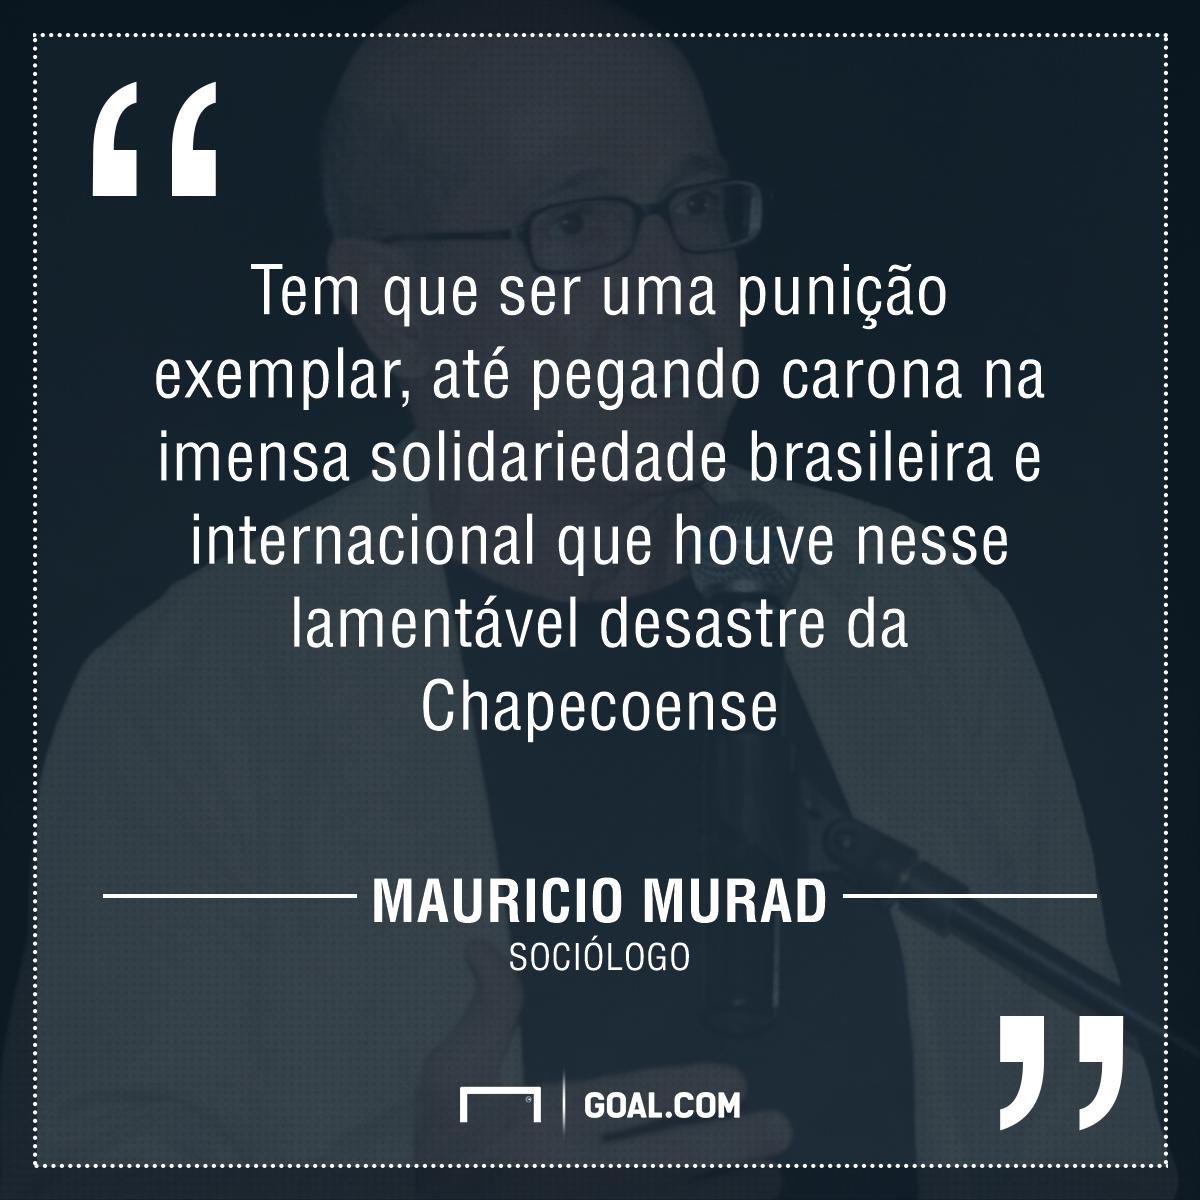 GFX Mauricio Murad 24 04 2017